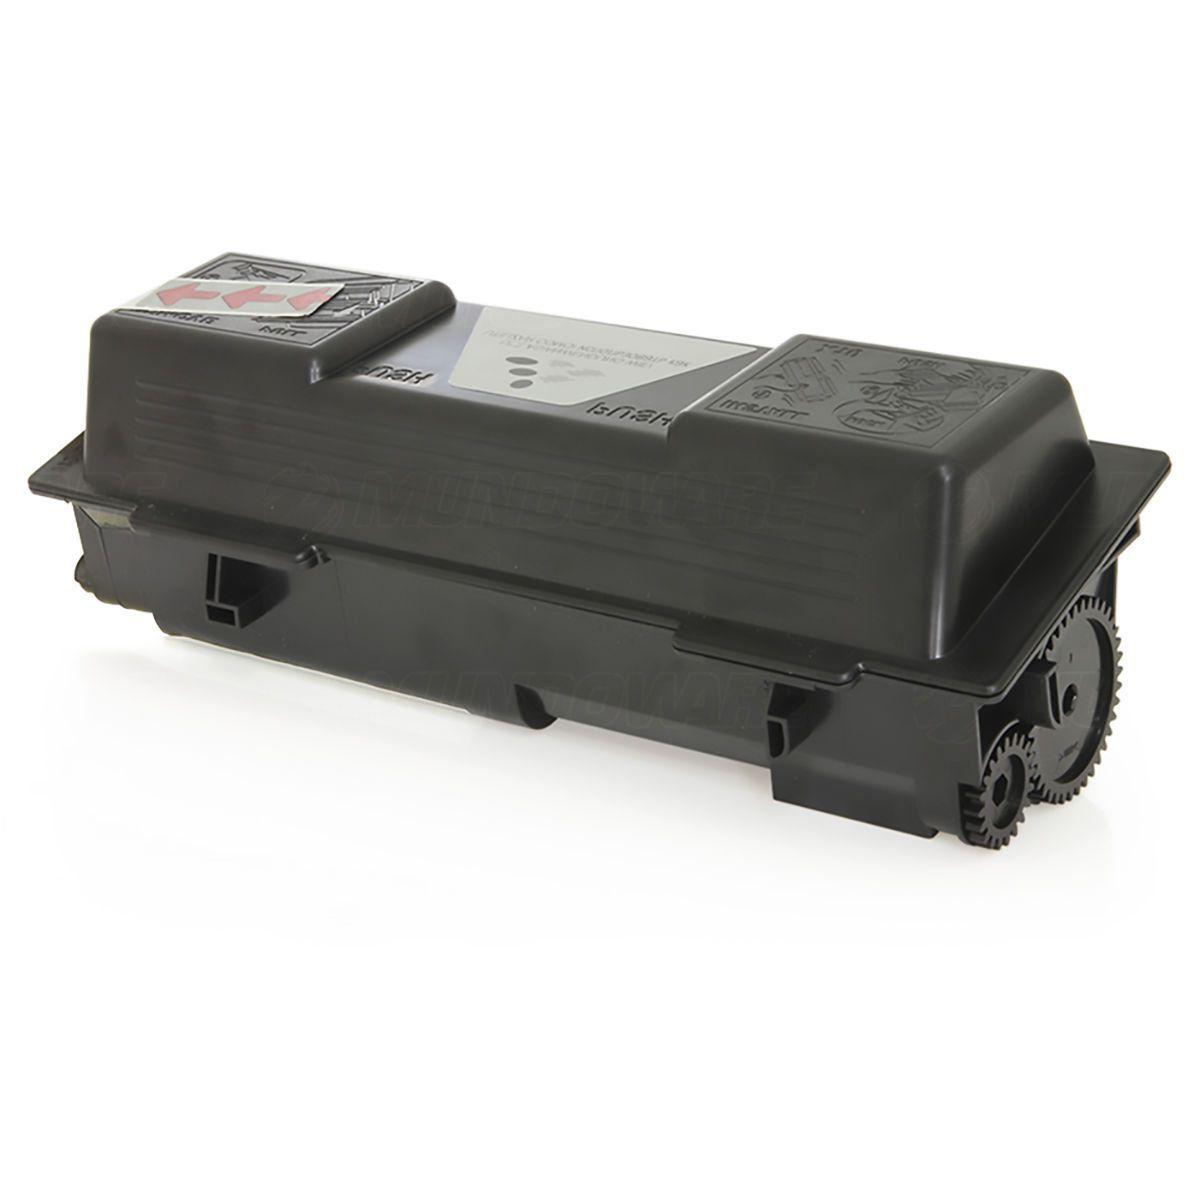 Compatível: Toner TK1147 TK-1147 para Kyocera FS1035 FS1135 M2035dn M2535dn M2035 M2535 FS-1035 1135 / Preto / 7.200